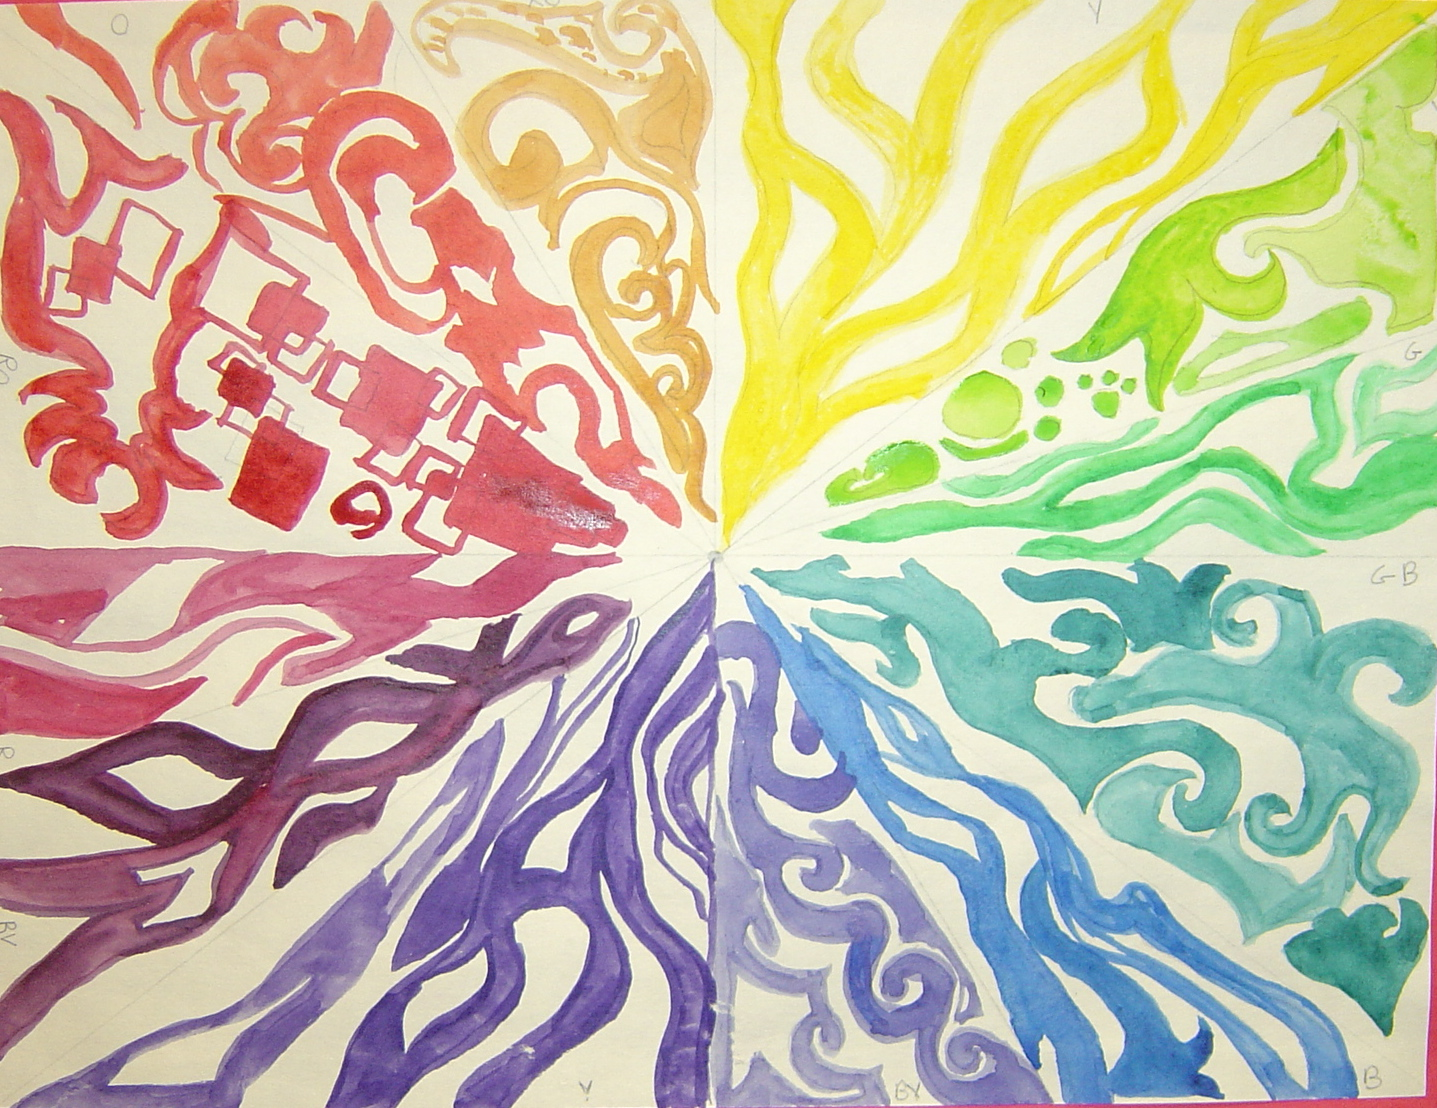 sinking springs art 5th grade creative color wheels. Black Bedroom Furniture Sets. Home Design Ideas